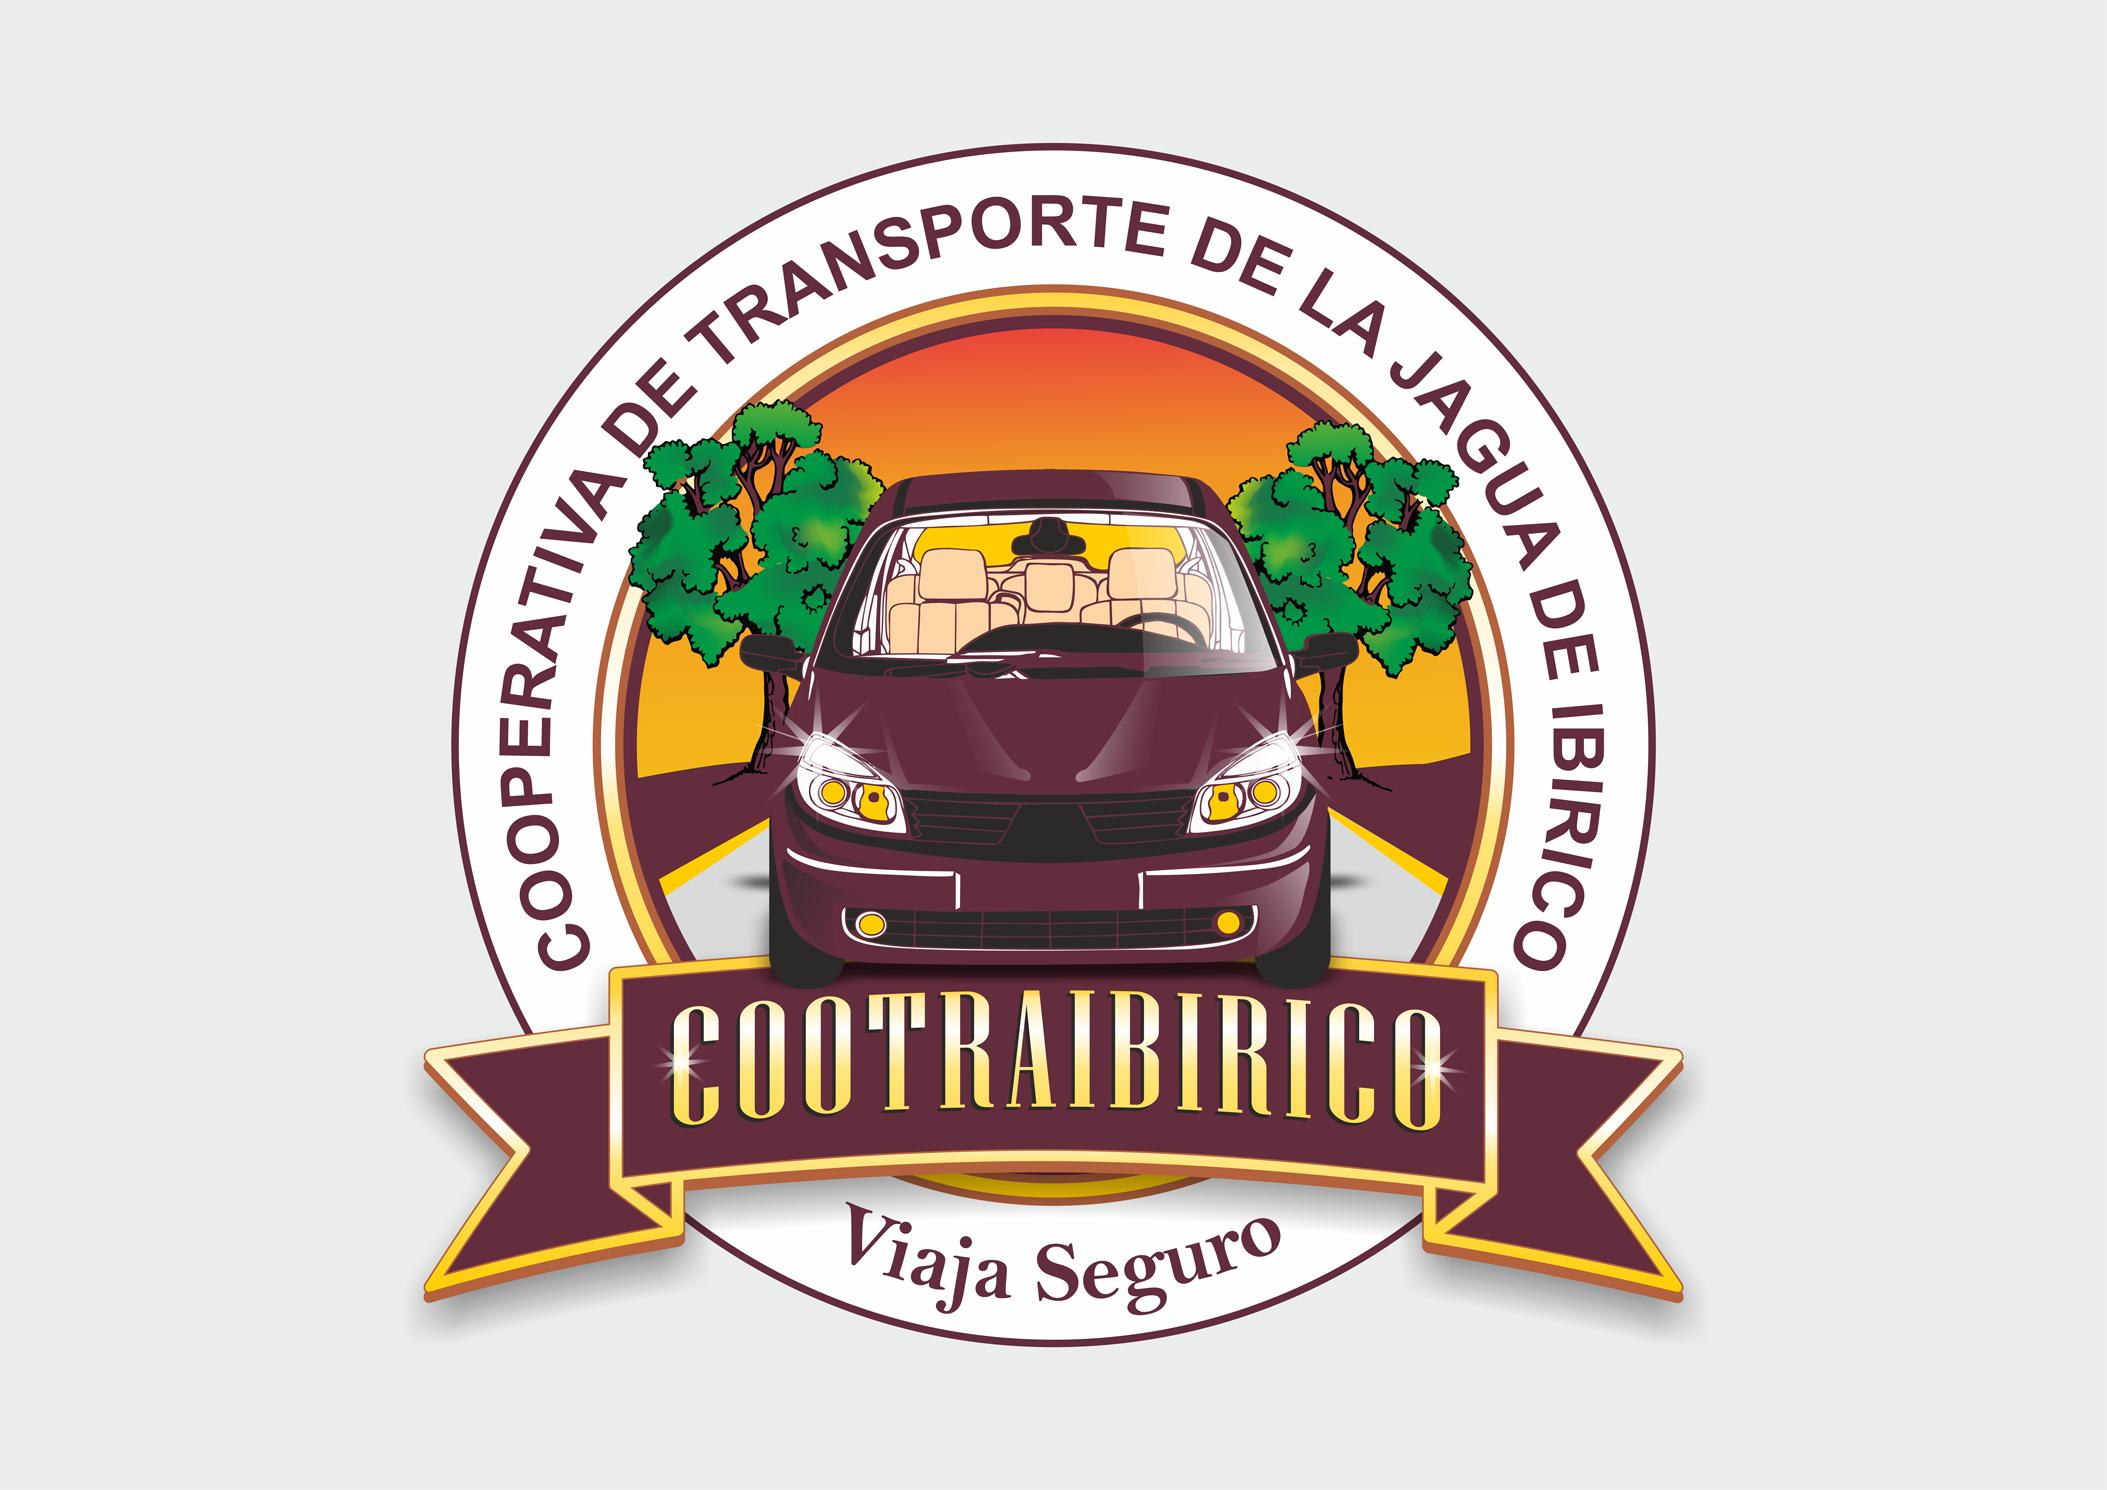 COOTRAIBIRICO | COLOMBIA